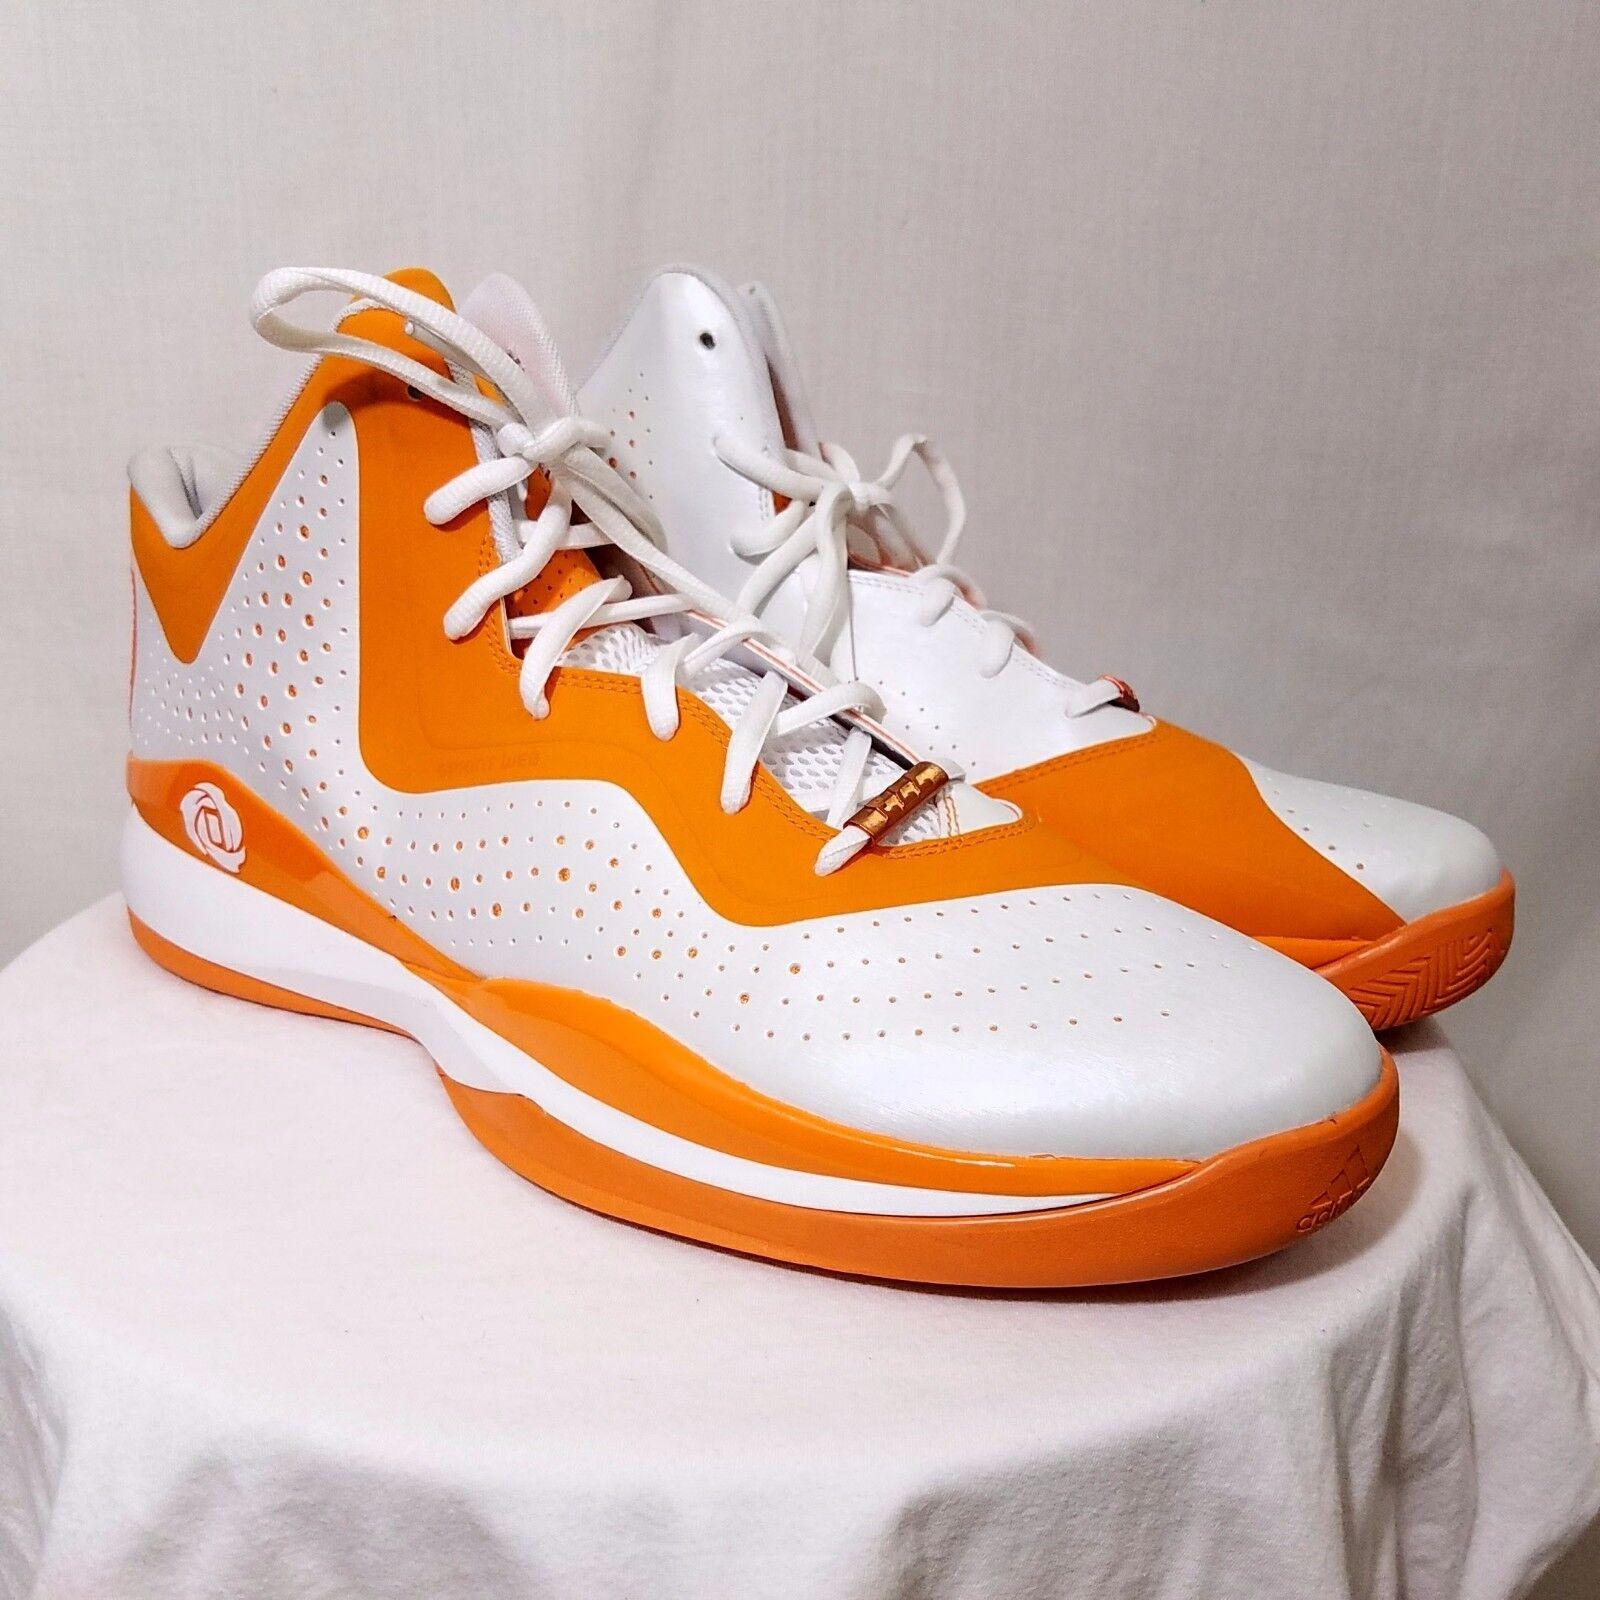 Adidas Mens Sm D pink 773 III Basketball shoes Derrick pink White orange US 19